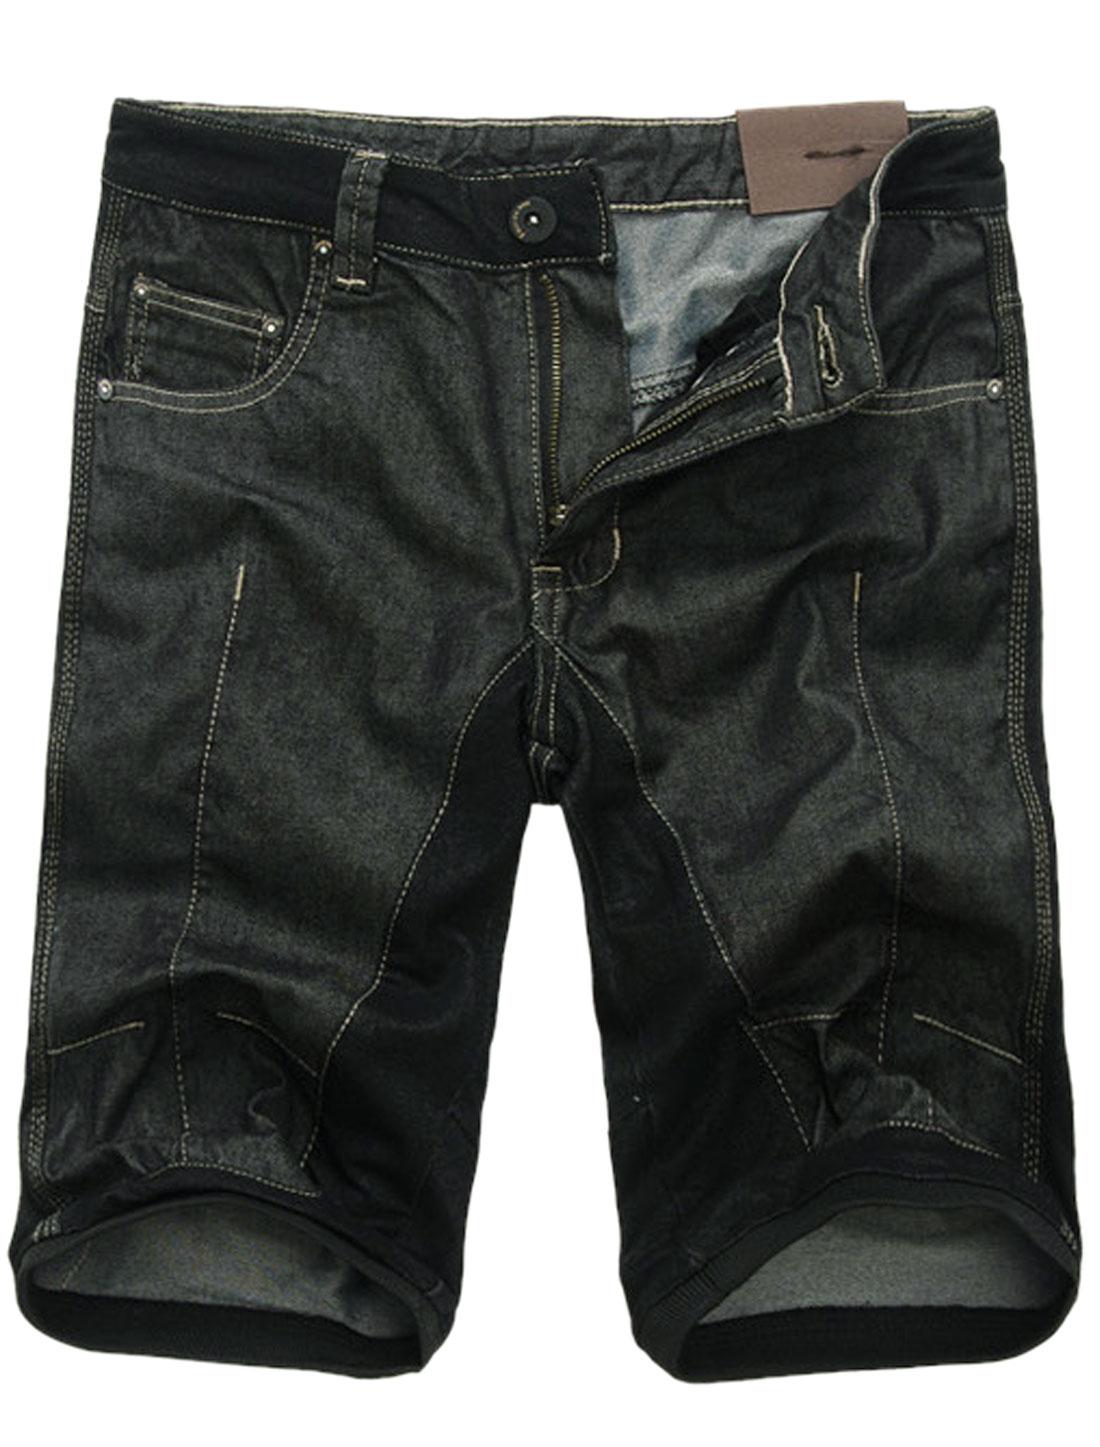 Men Zip Fly Single Button Closure Panel Denim Shorts Black W30